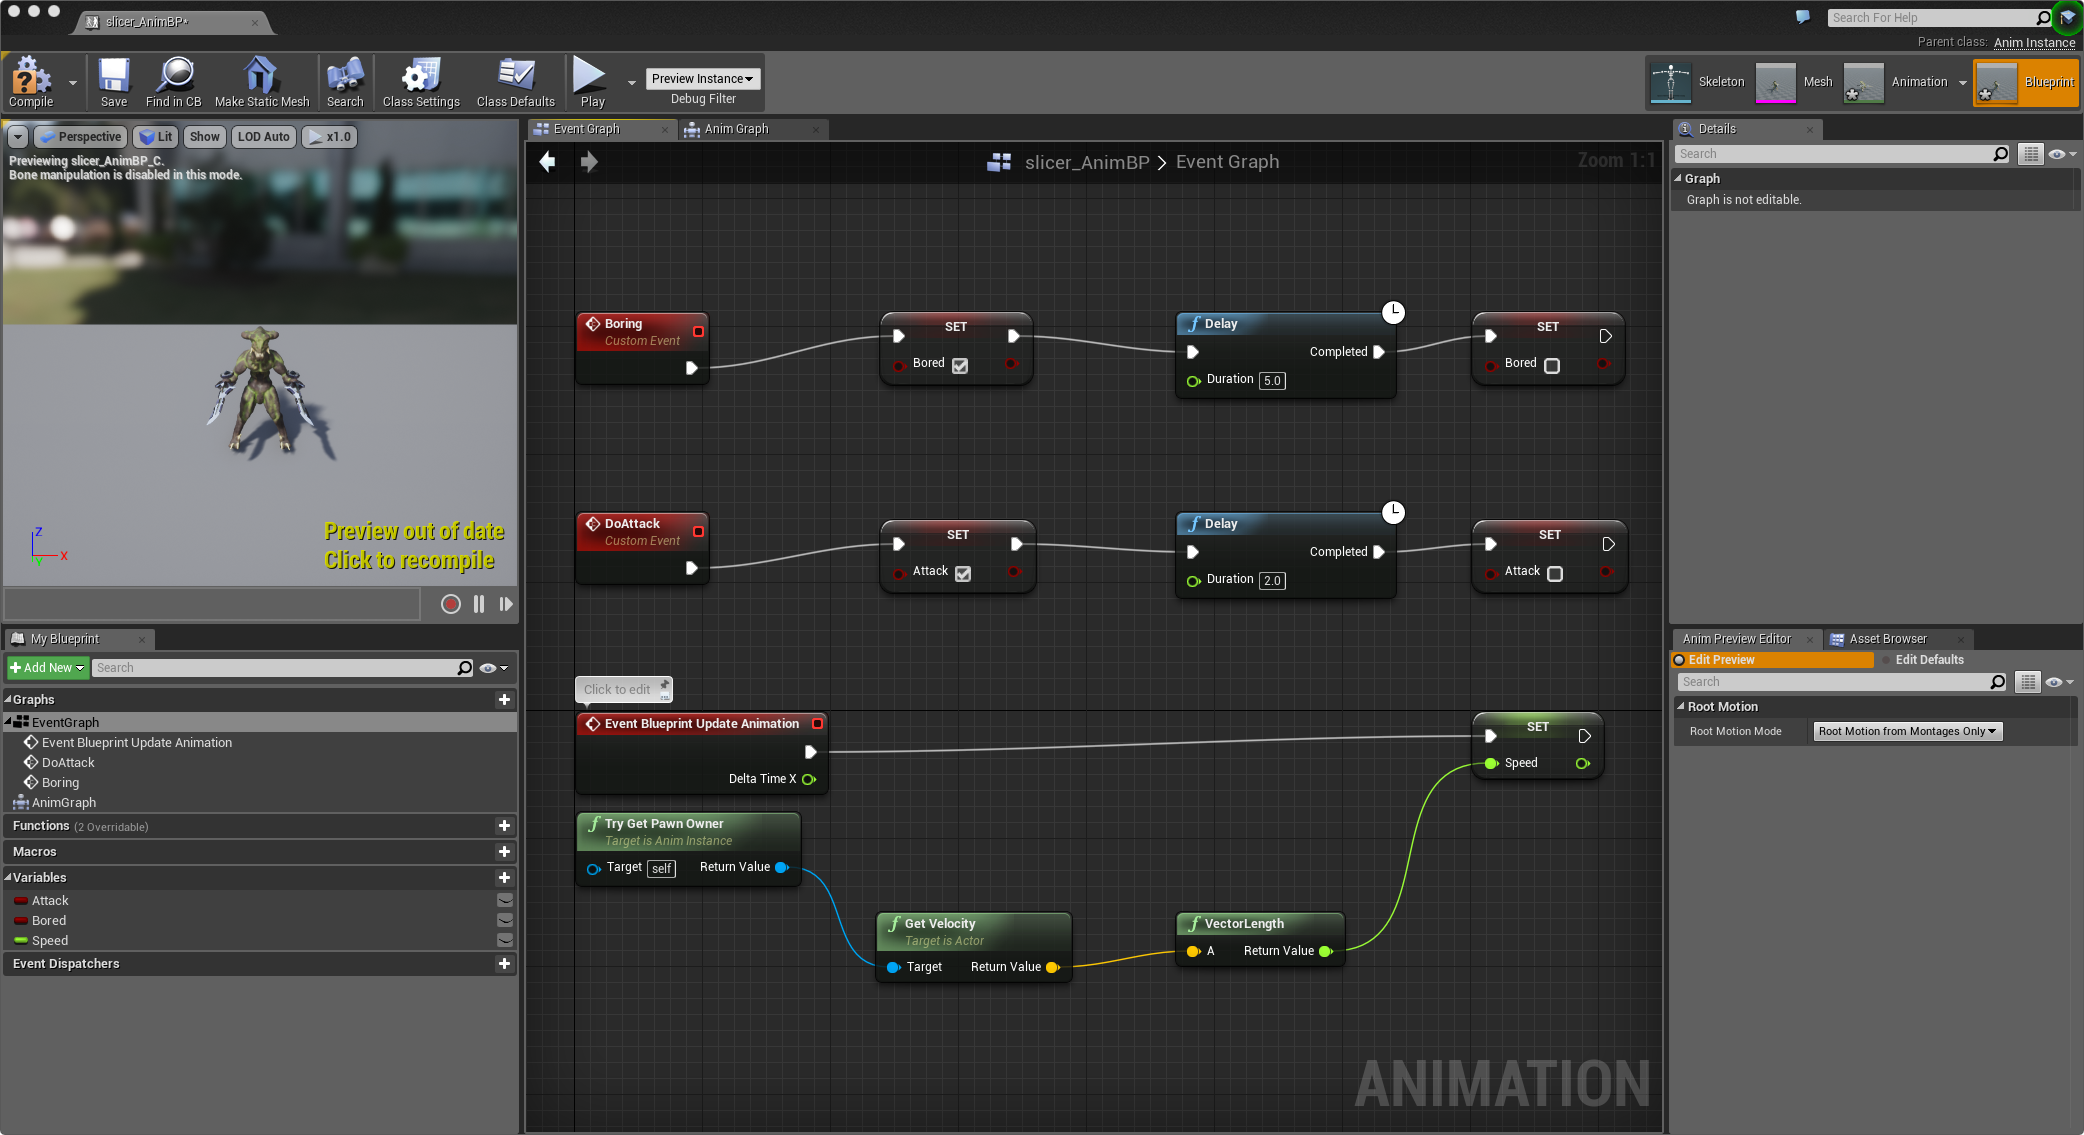 The Kaiju Animation Blueprint Event Graph